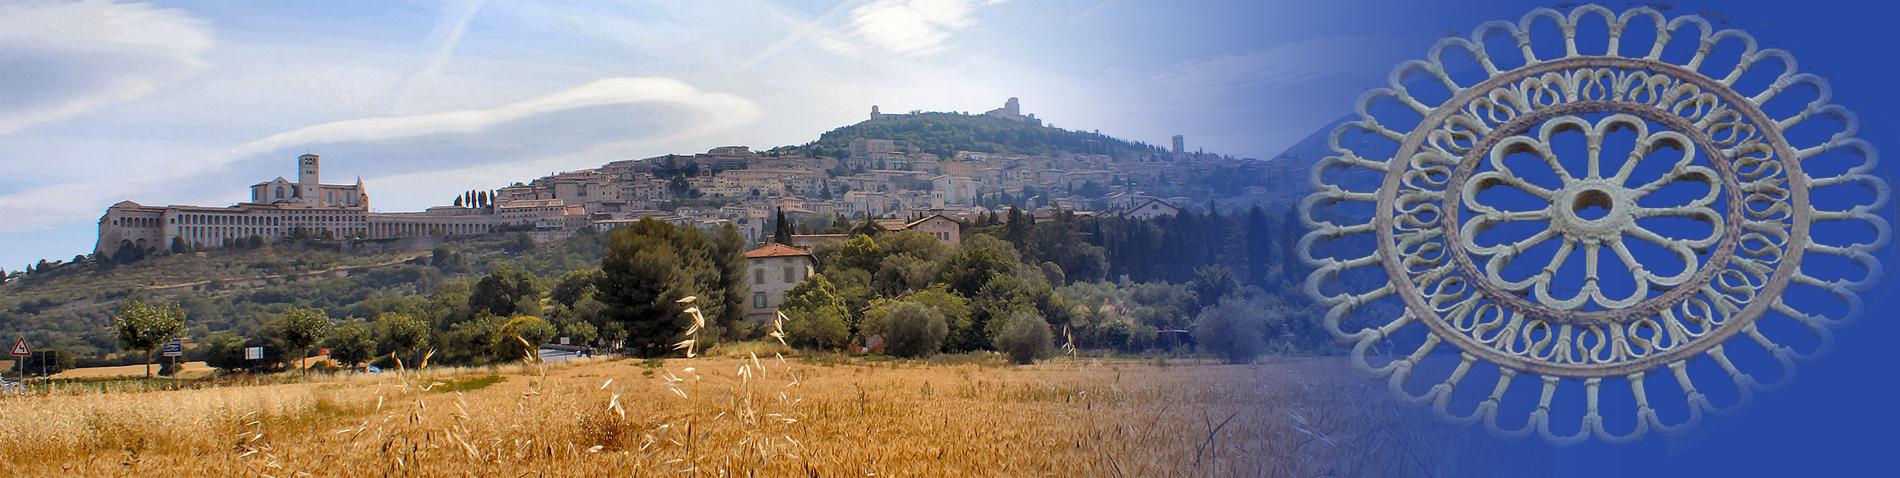 Diocesi di Assisi Nocera Umbra Gualdo Tadino